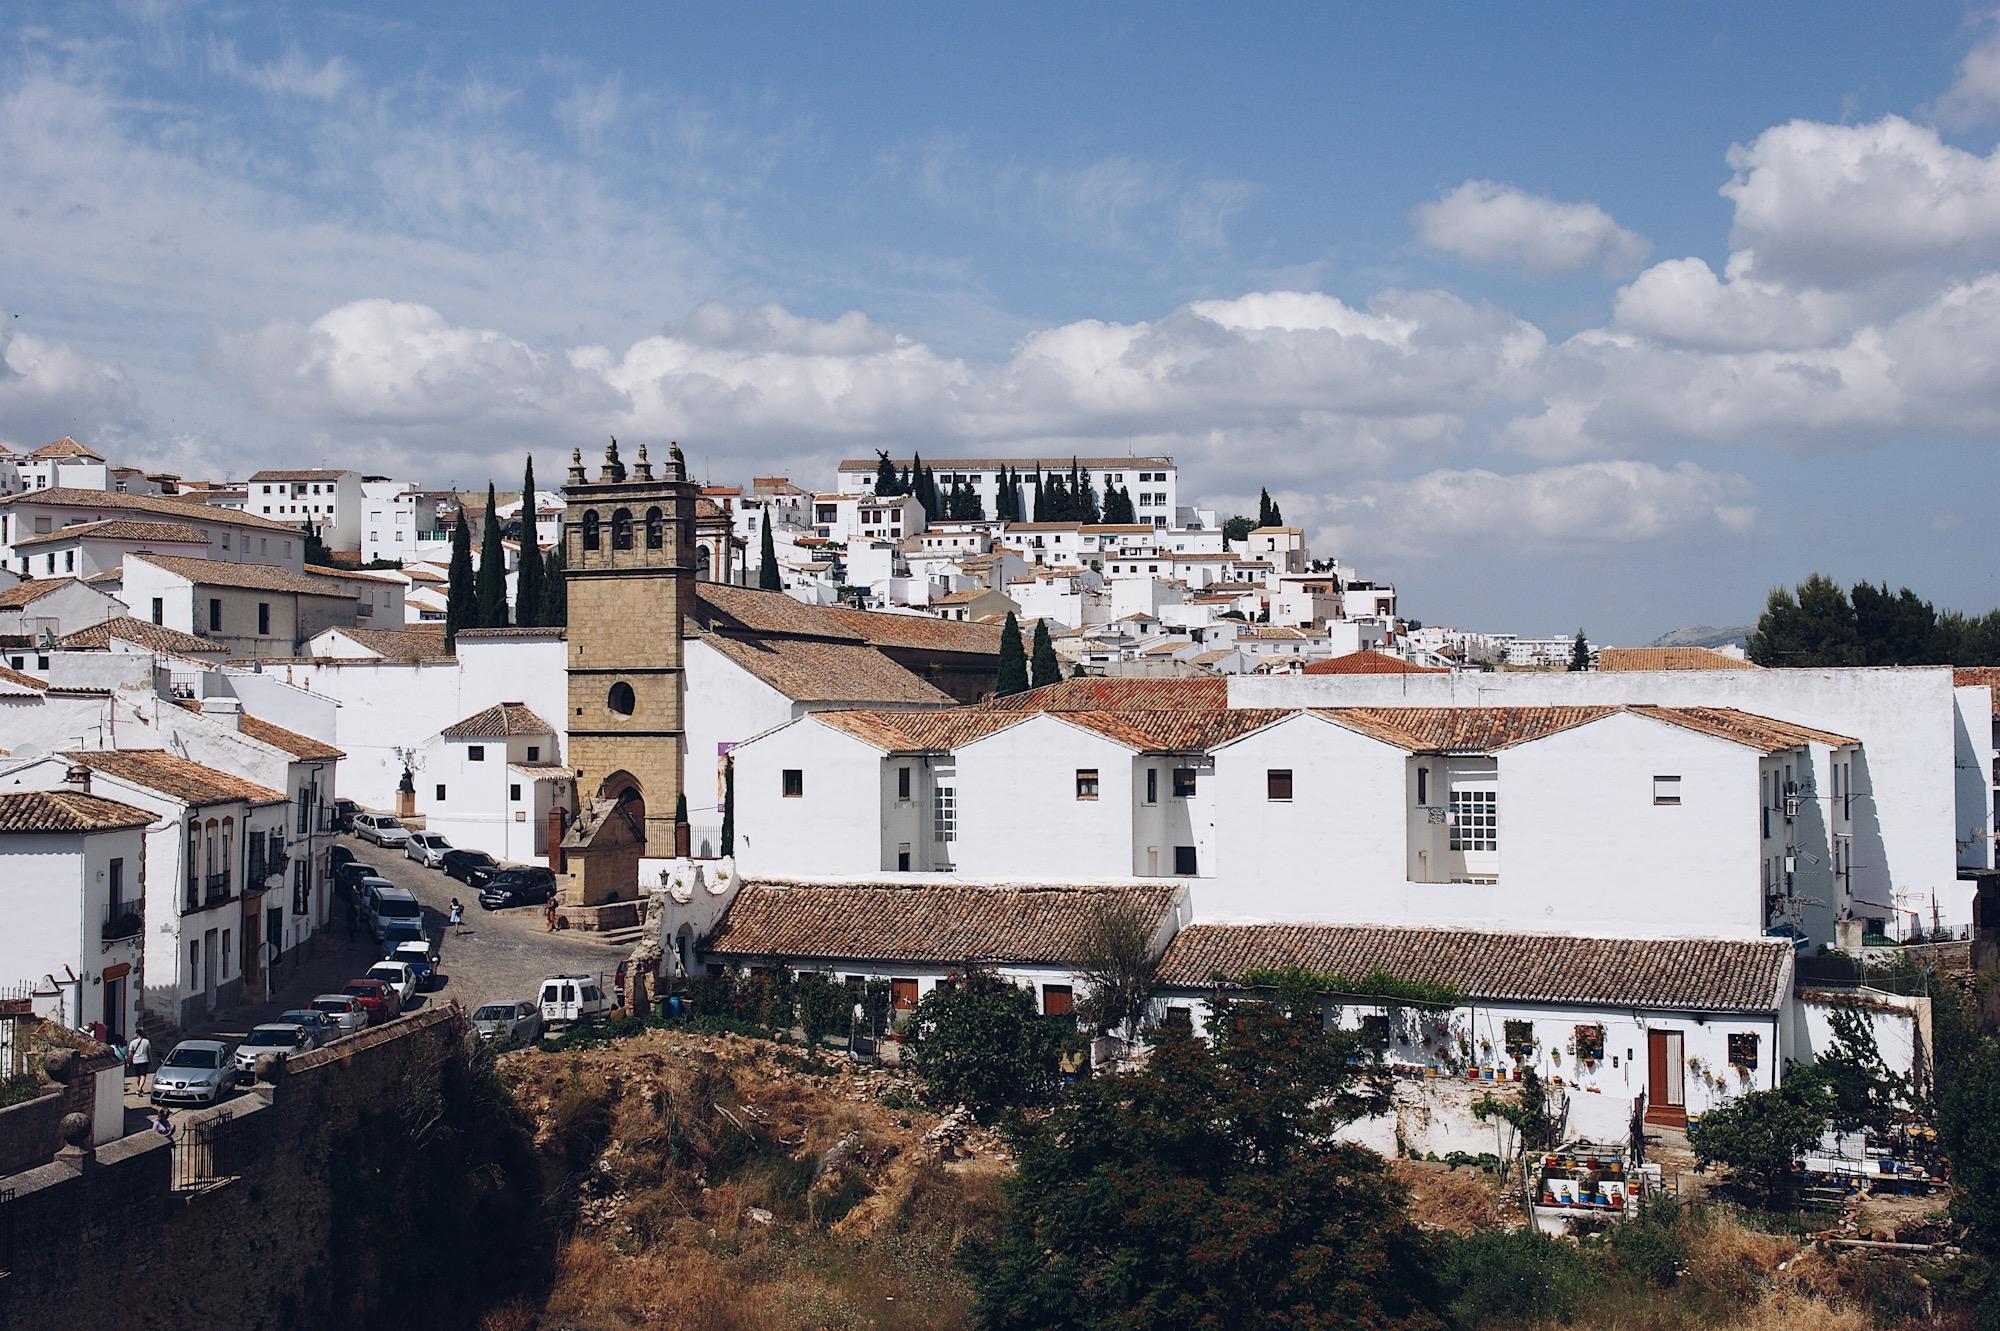 Ronda Altstadt, Ronda Reisebericht Spanien Andalusien Reise